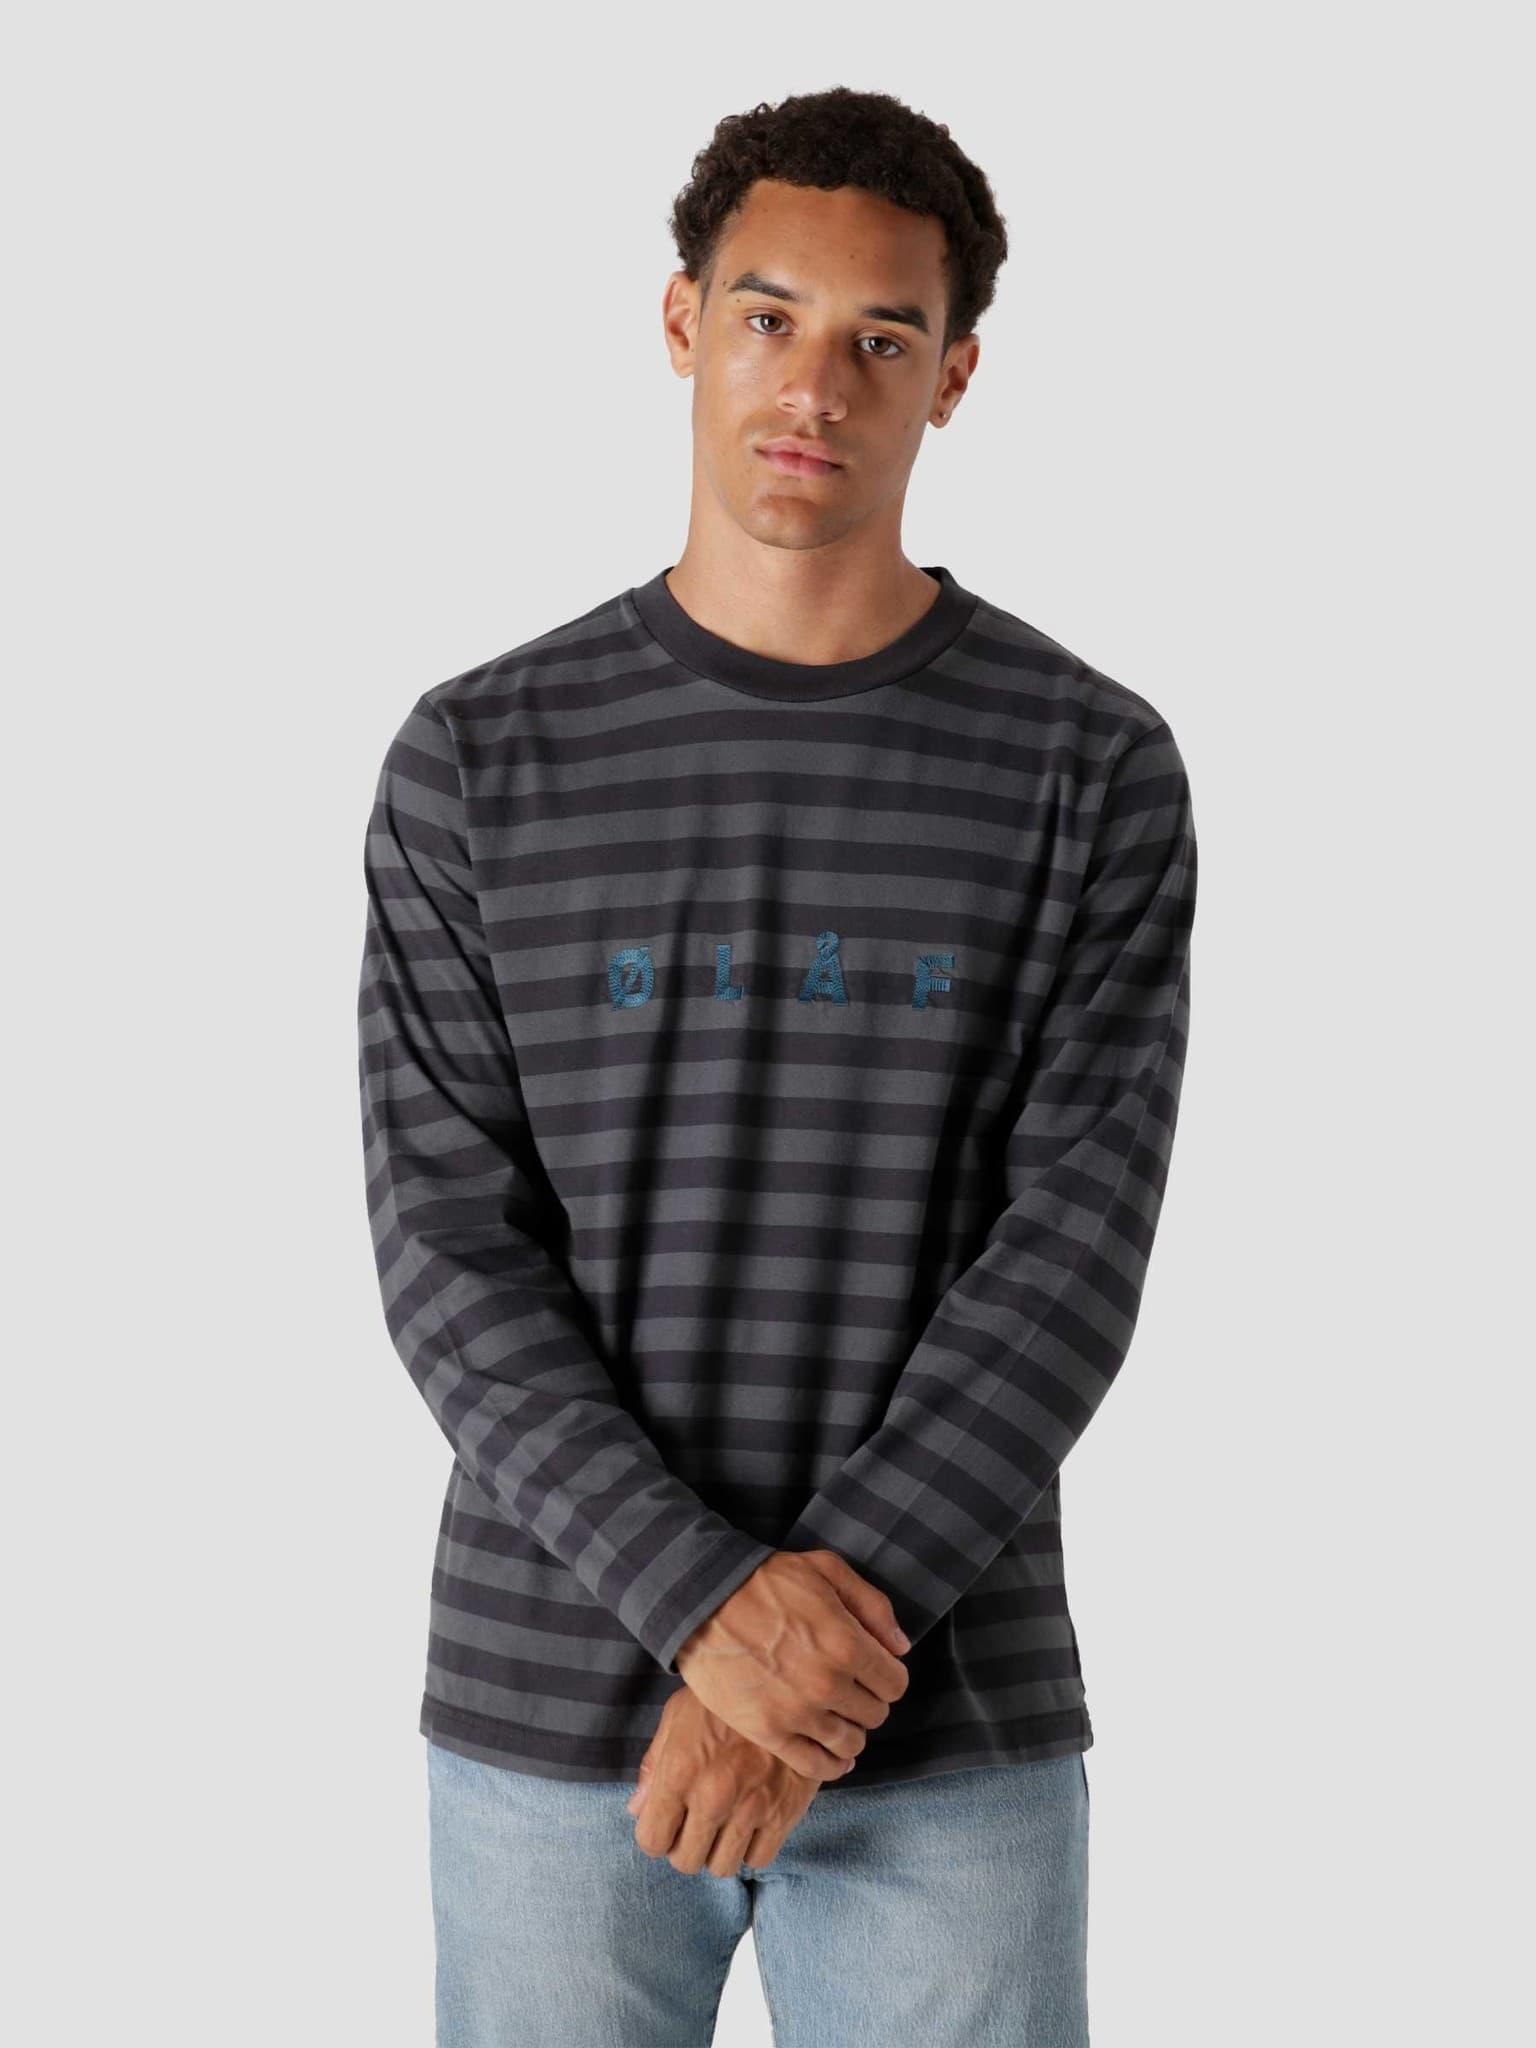 OLAF Stripe Longsleeve Medium Grey Dark Grey